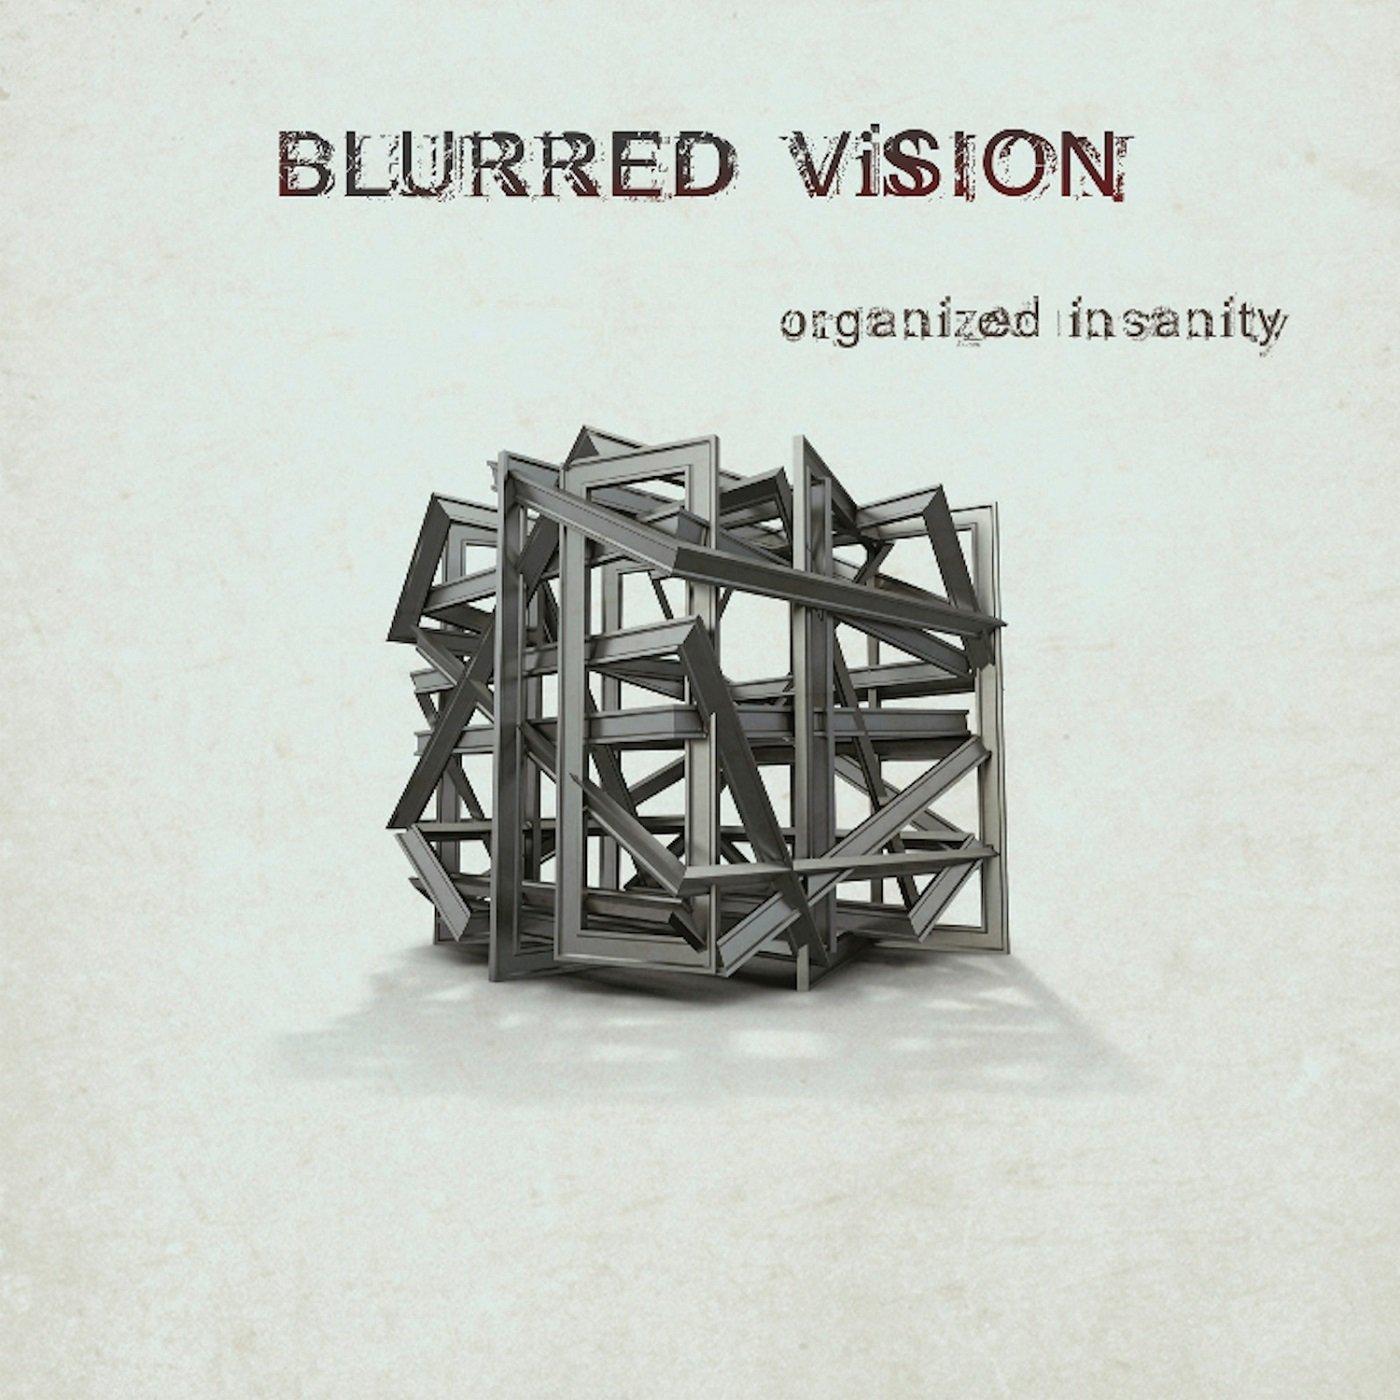 BLURRED VISION Organized Insanity